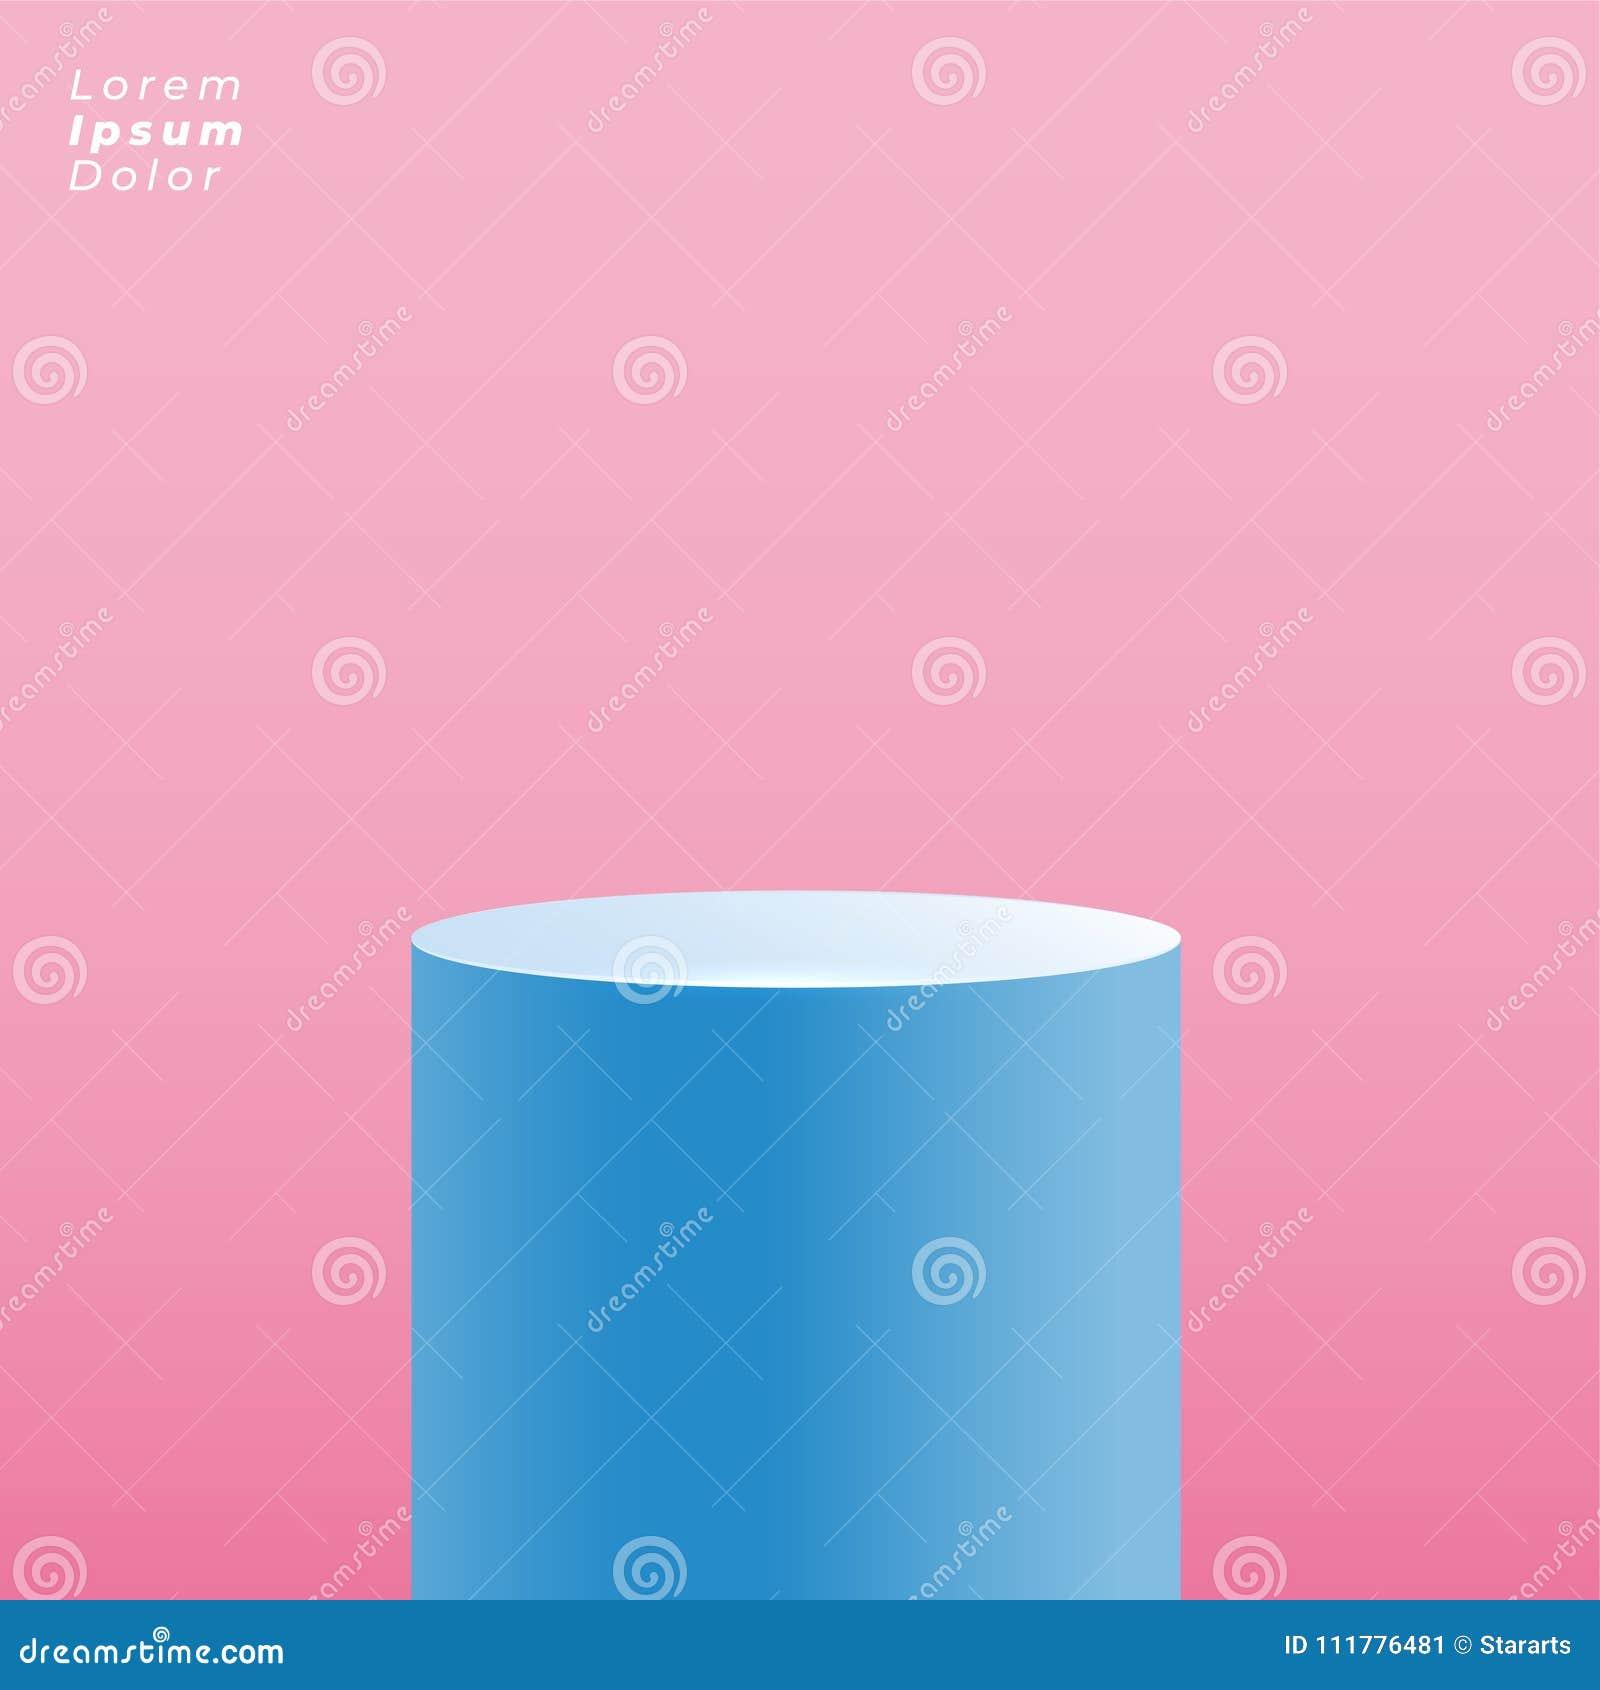 Round platform for product display presentation